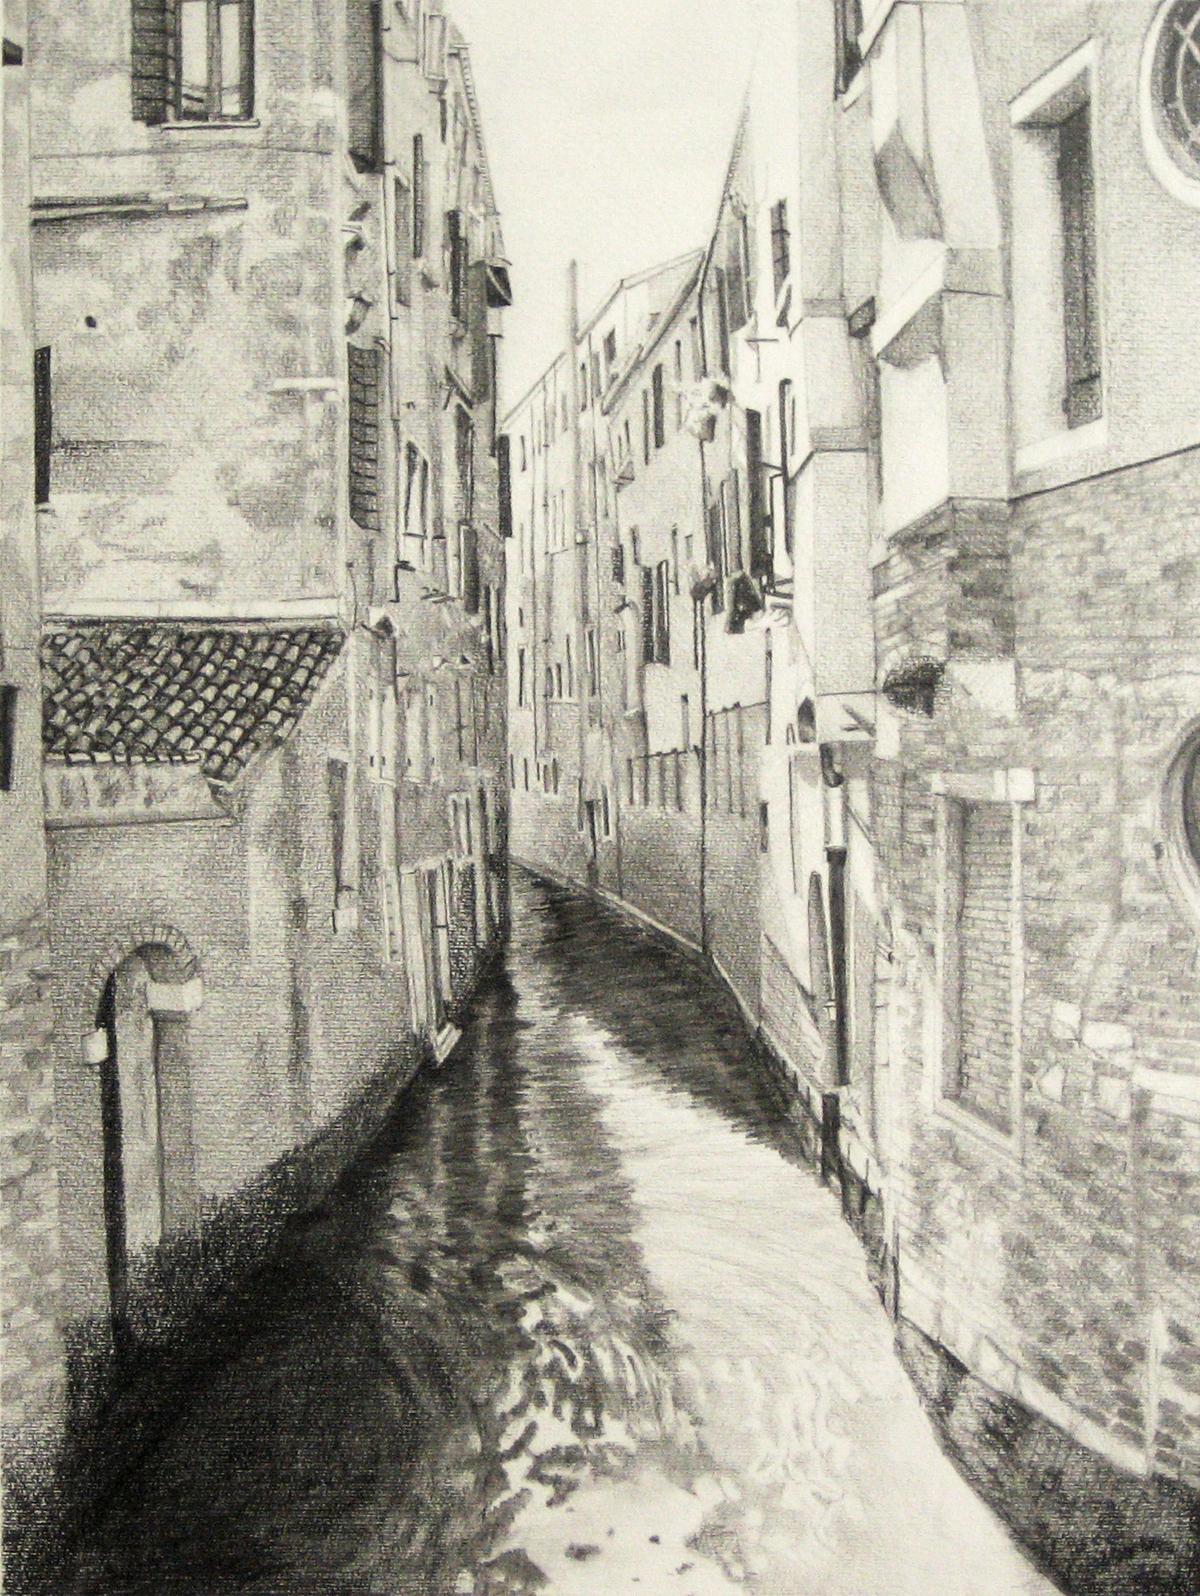 Waterway: Venice, Italy